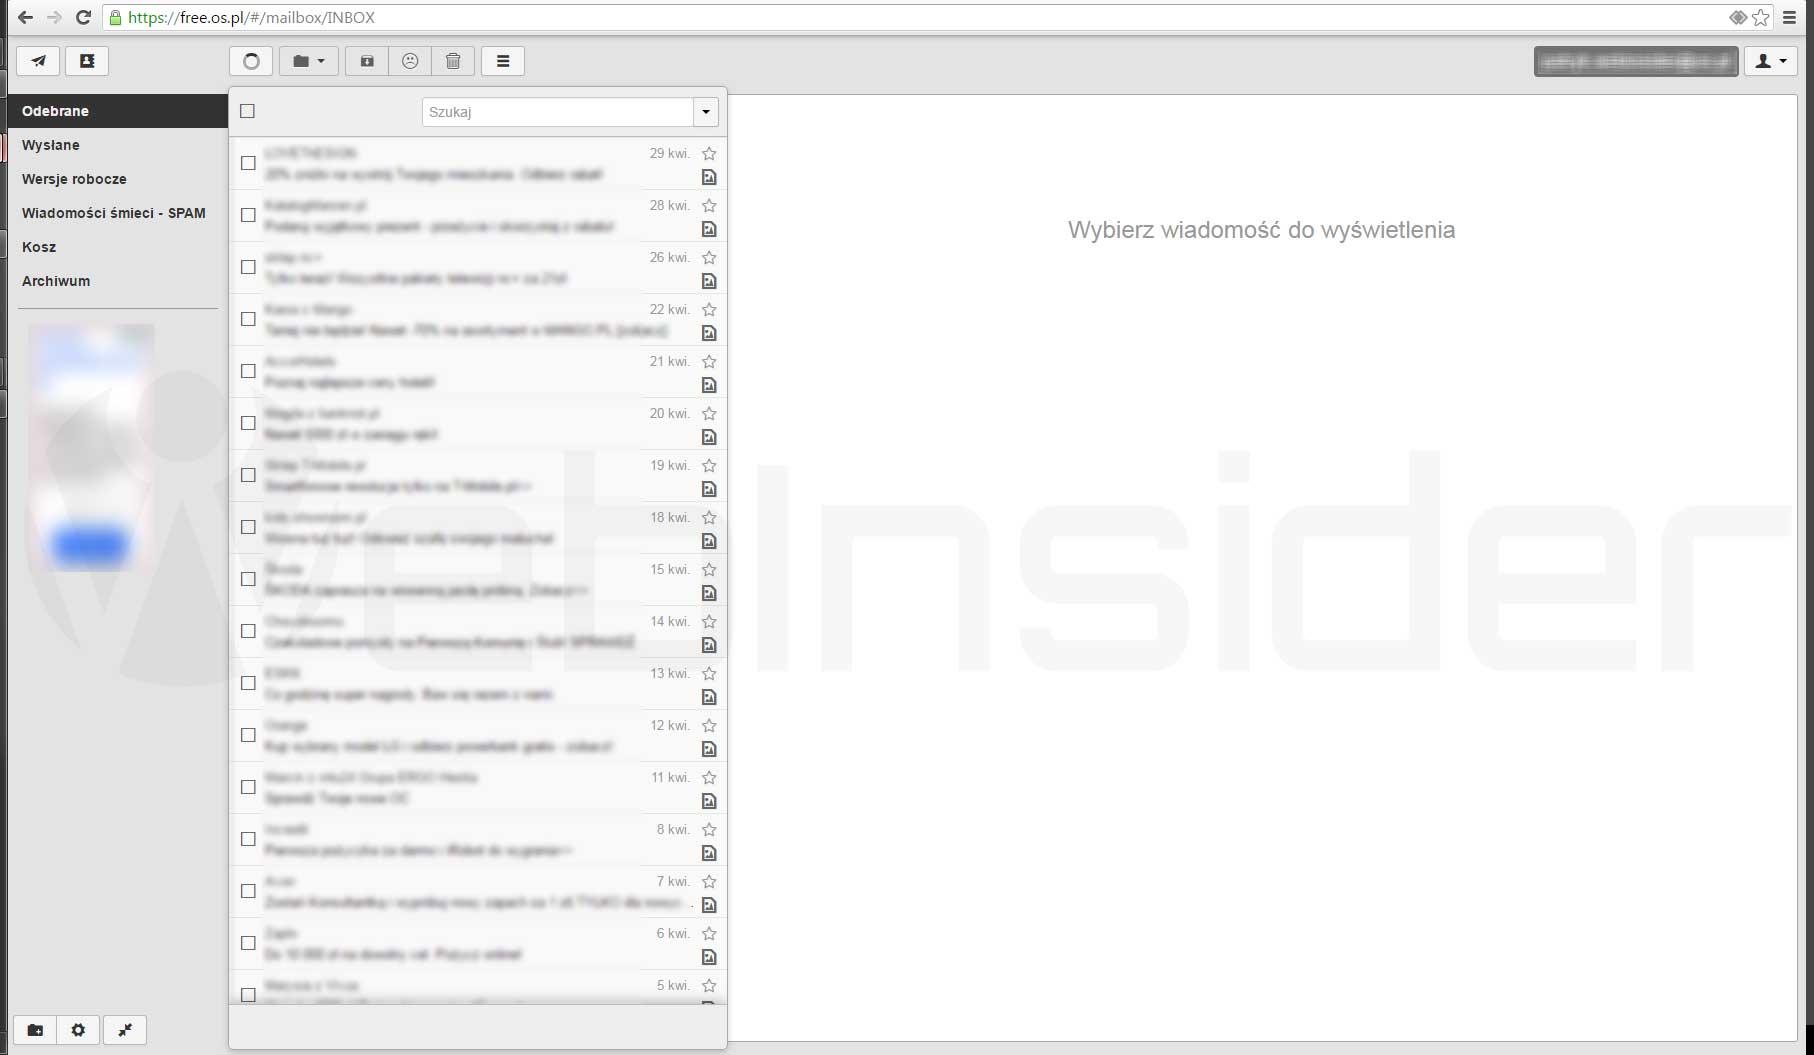 test_poczta-email_reklamy_201604_free-os-pl